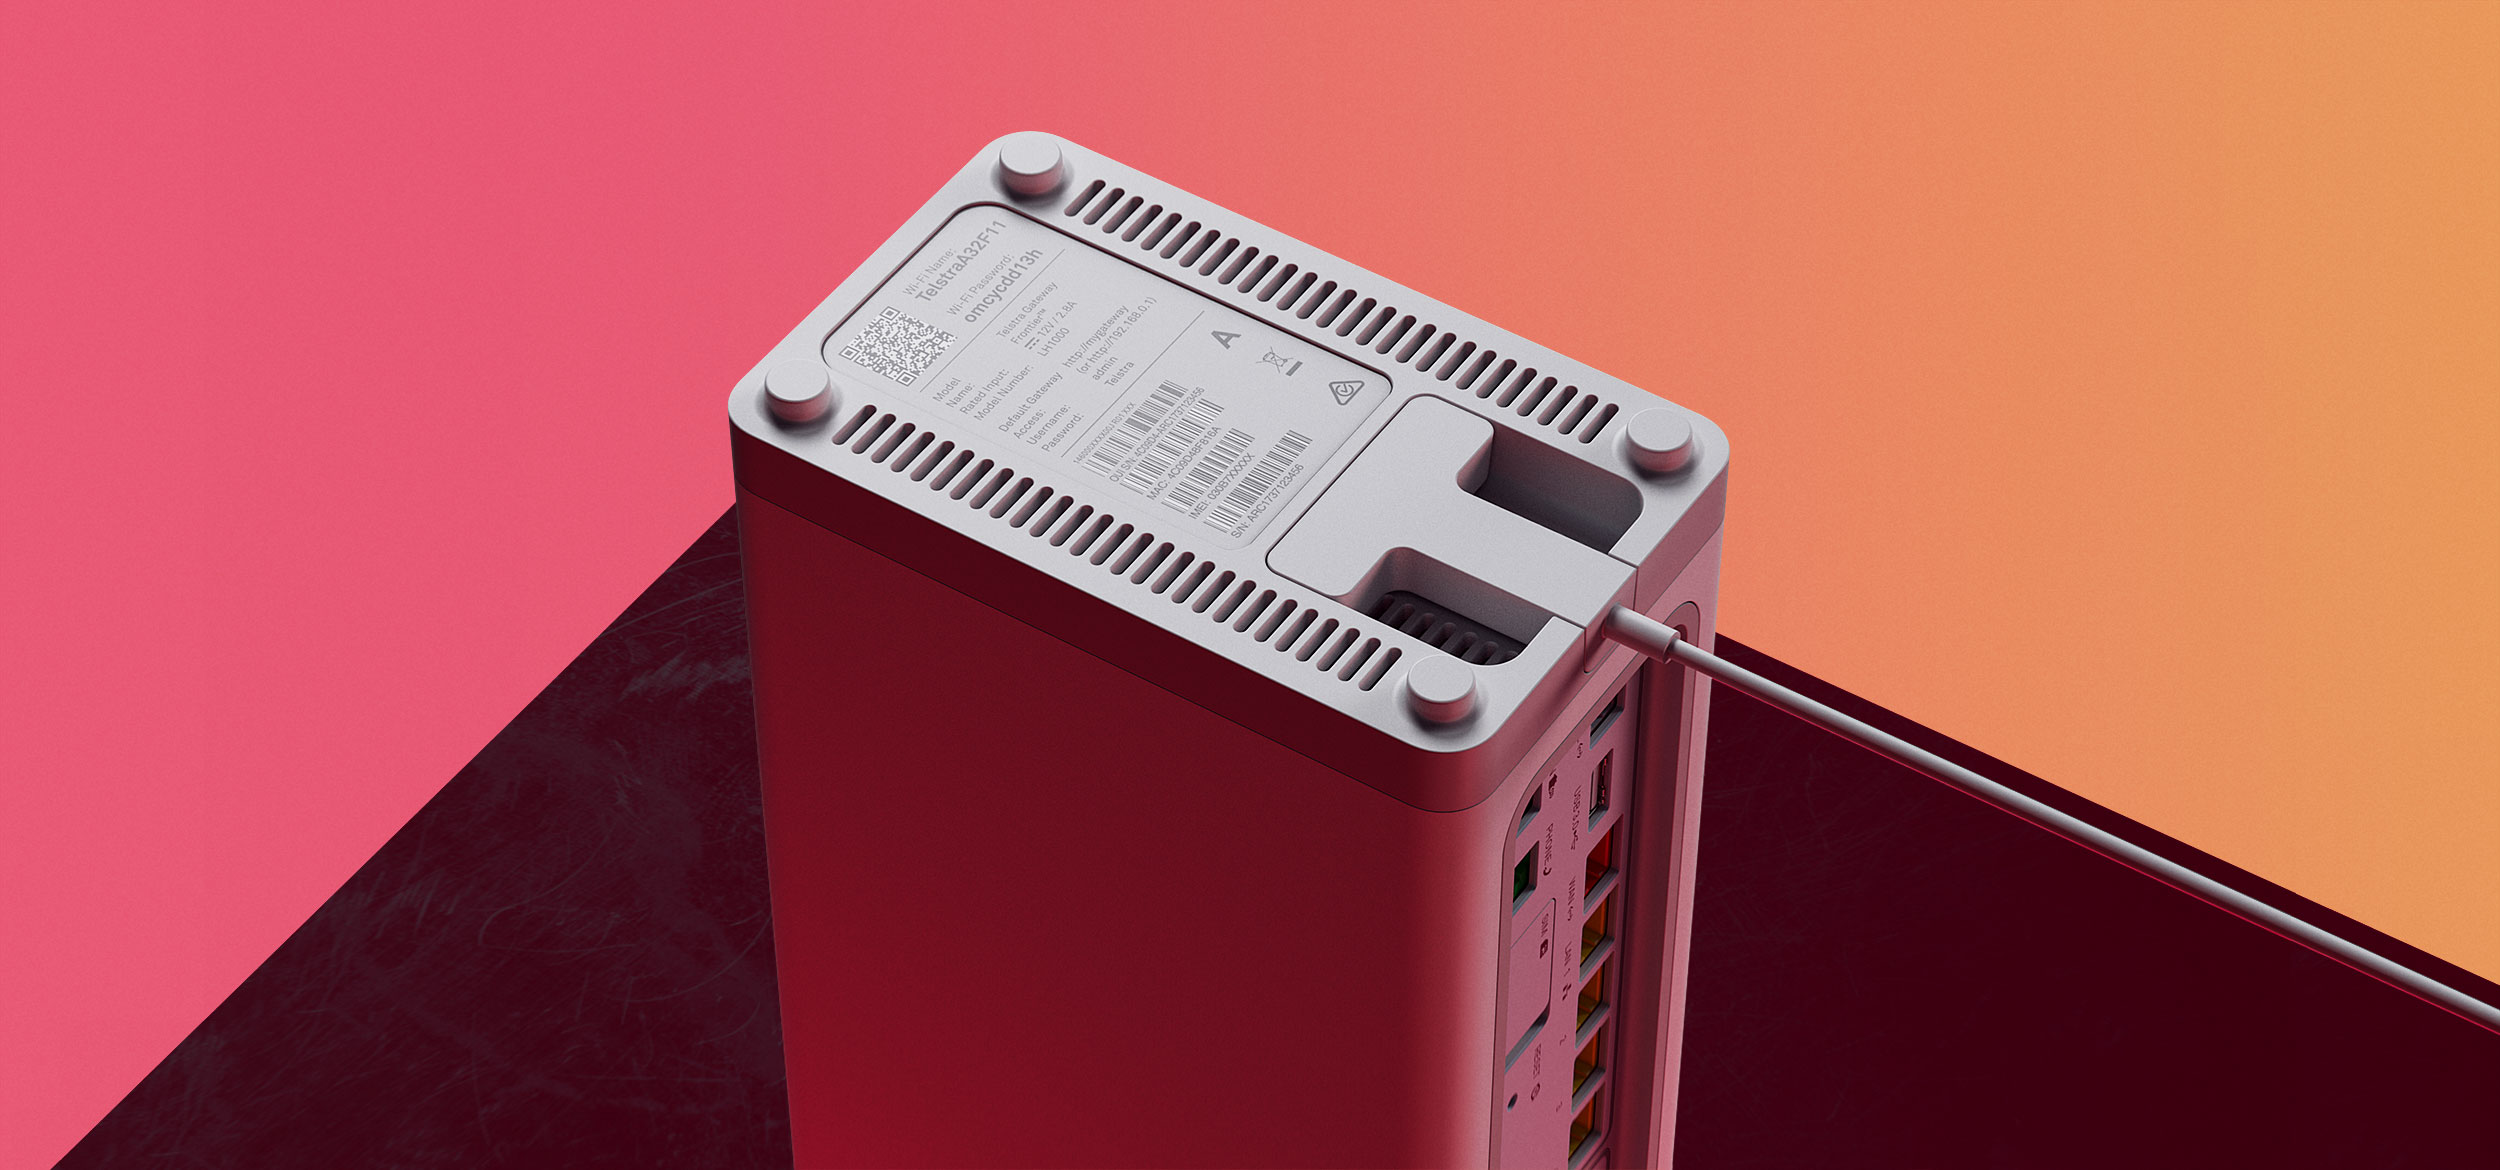 Telstra Smart Modem Gen 2